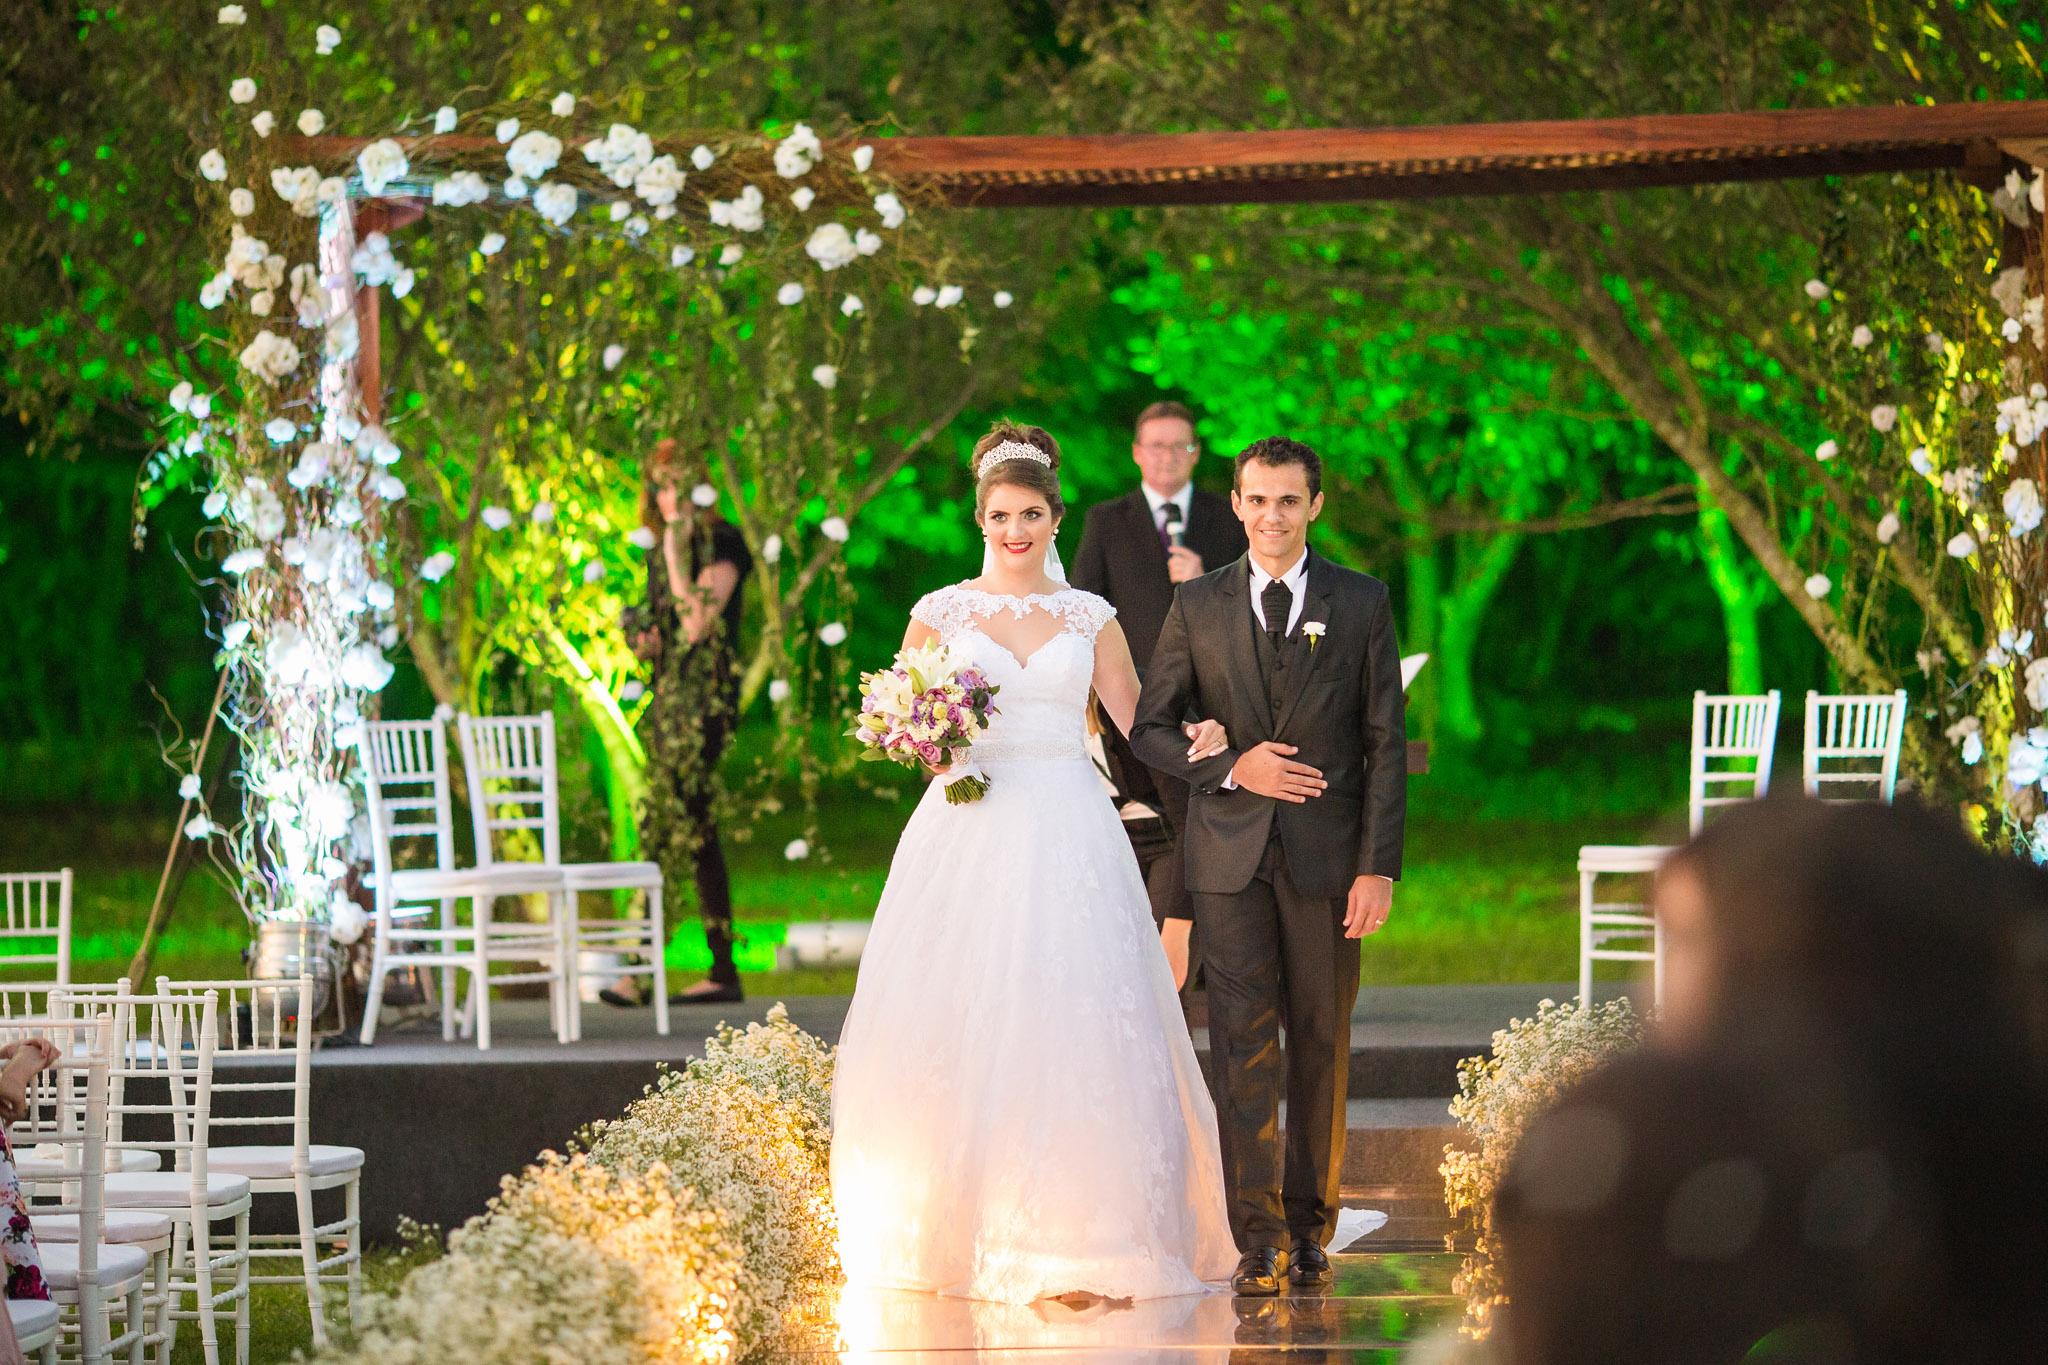 Wedding_Travellers_Destination_Wedding_Photography-152.jpg